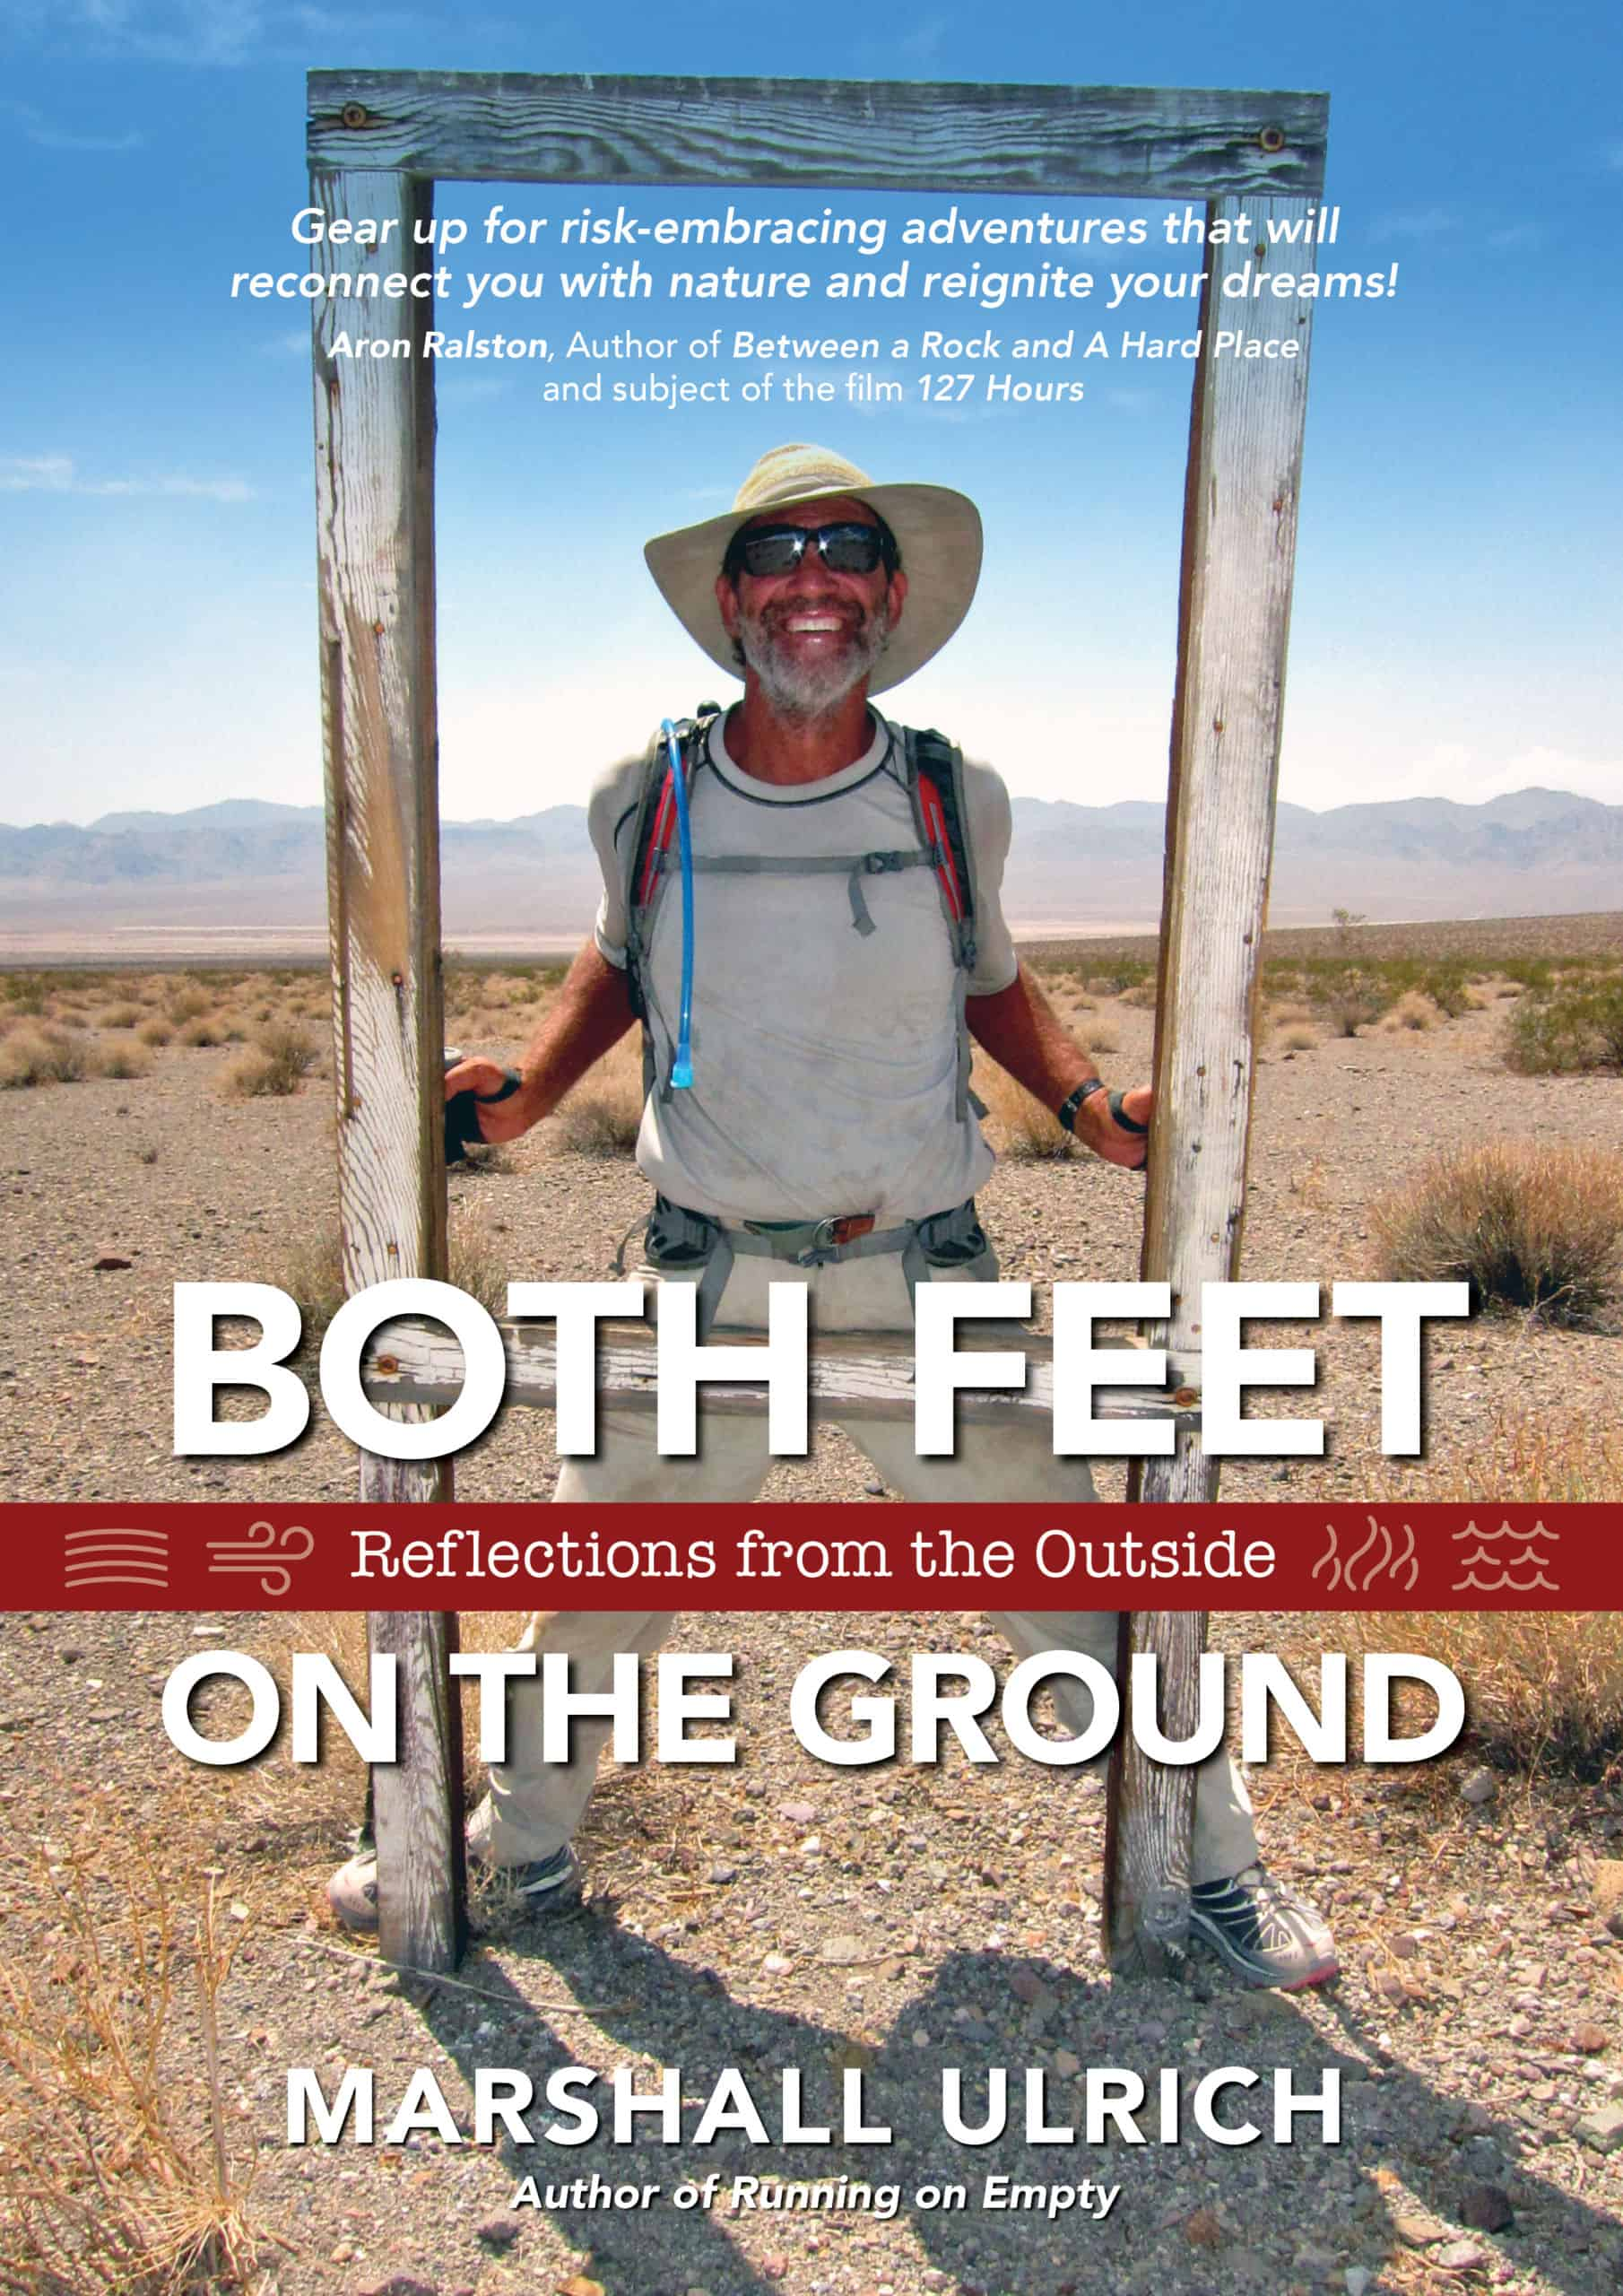 Marshall Ulrich, Both Feet on the Ground